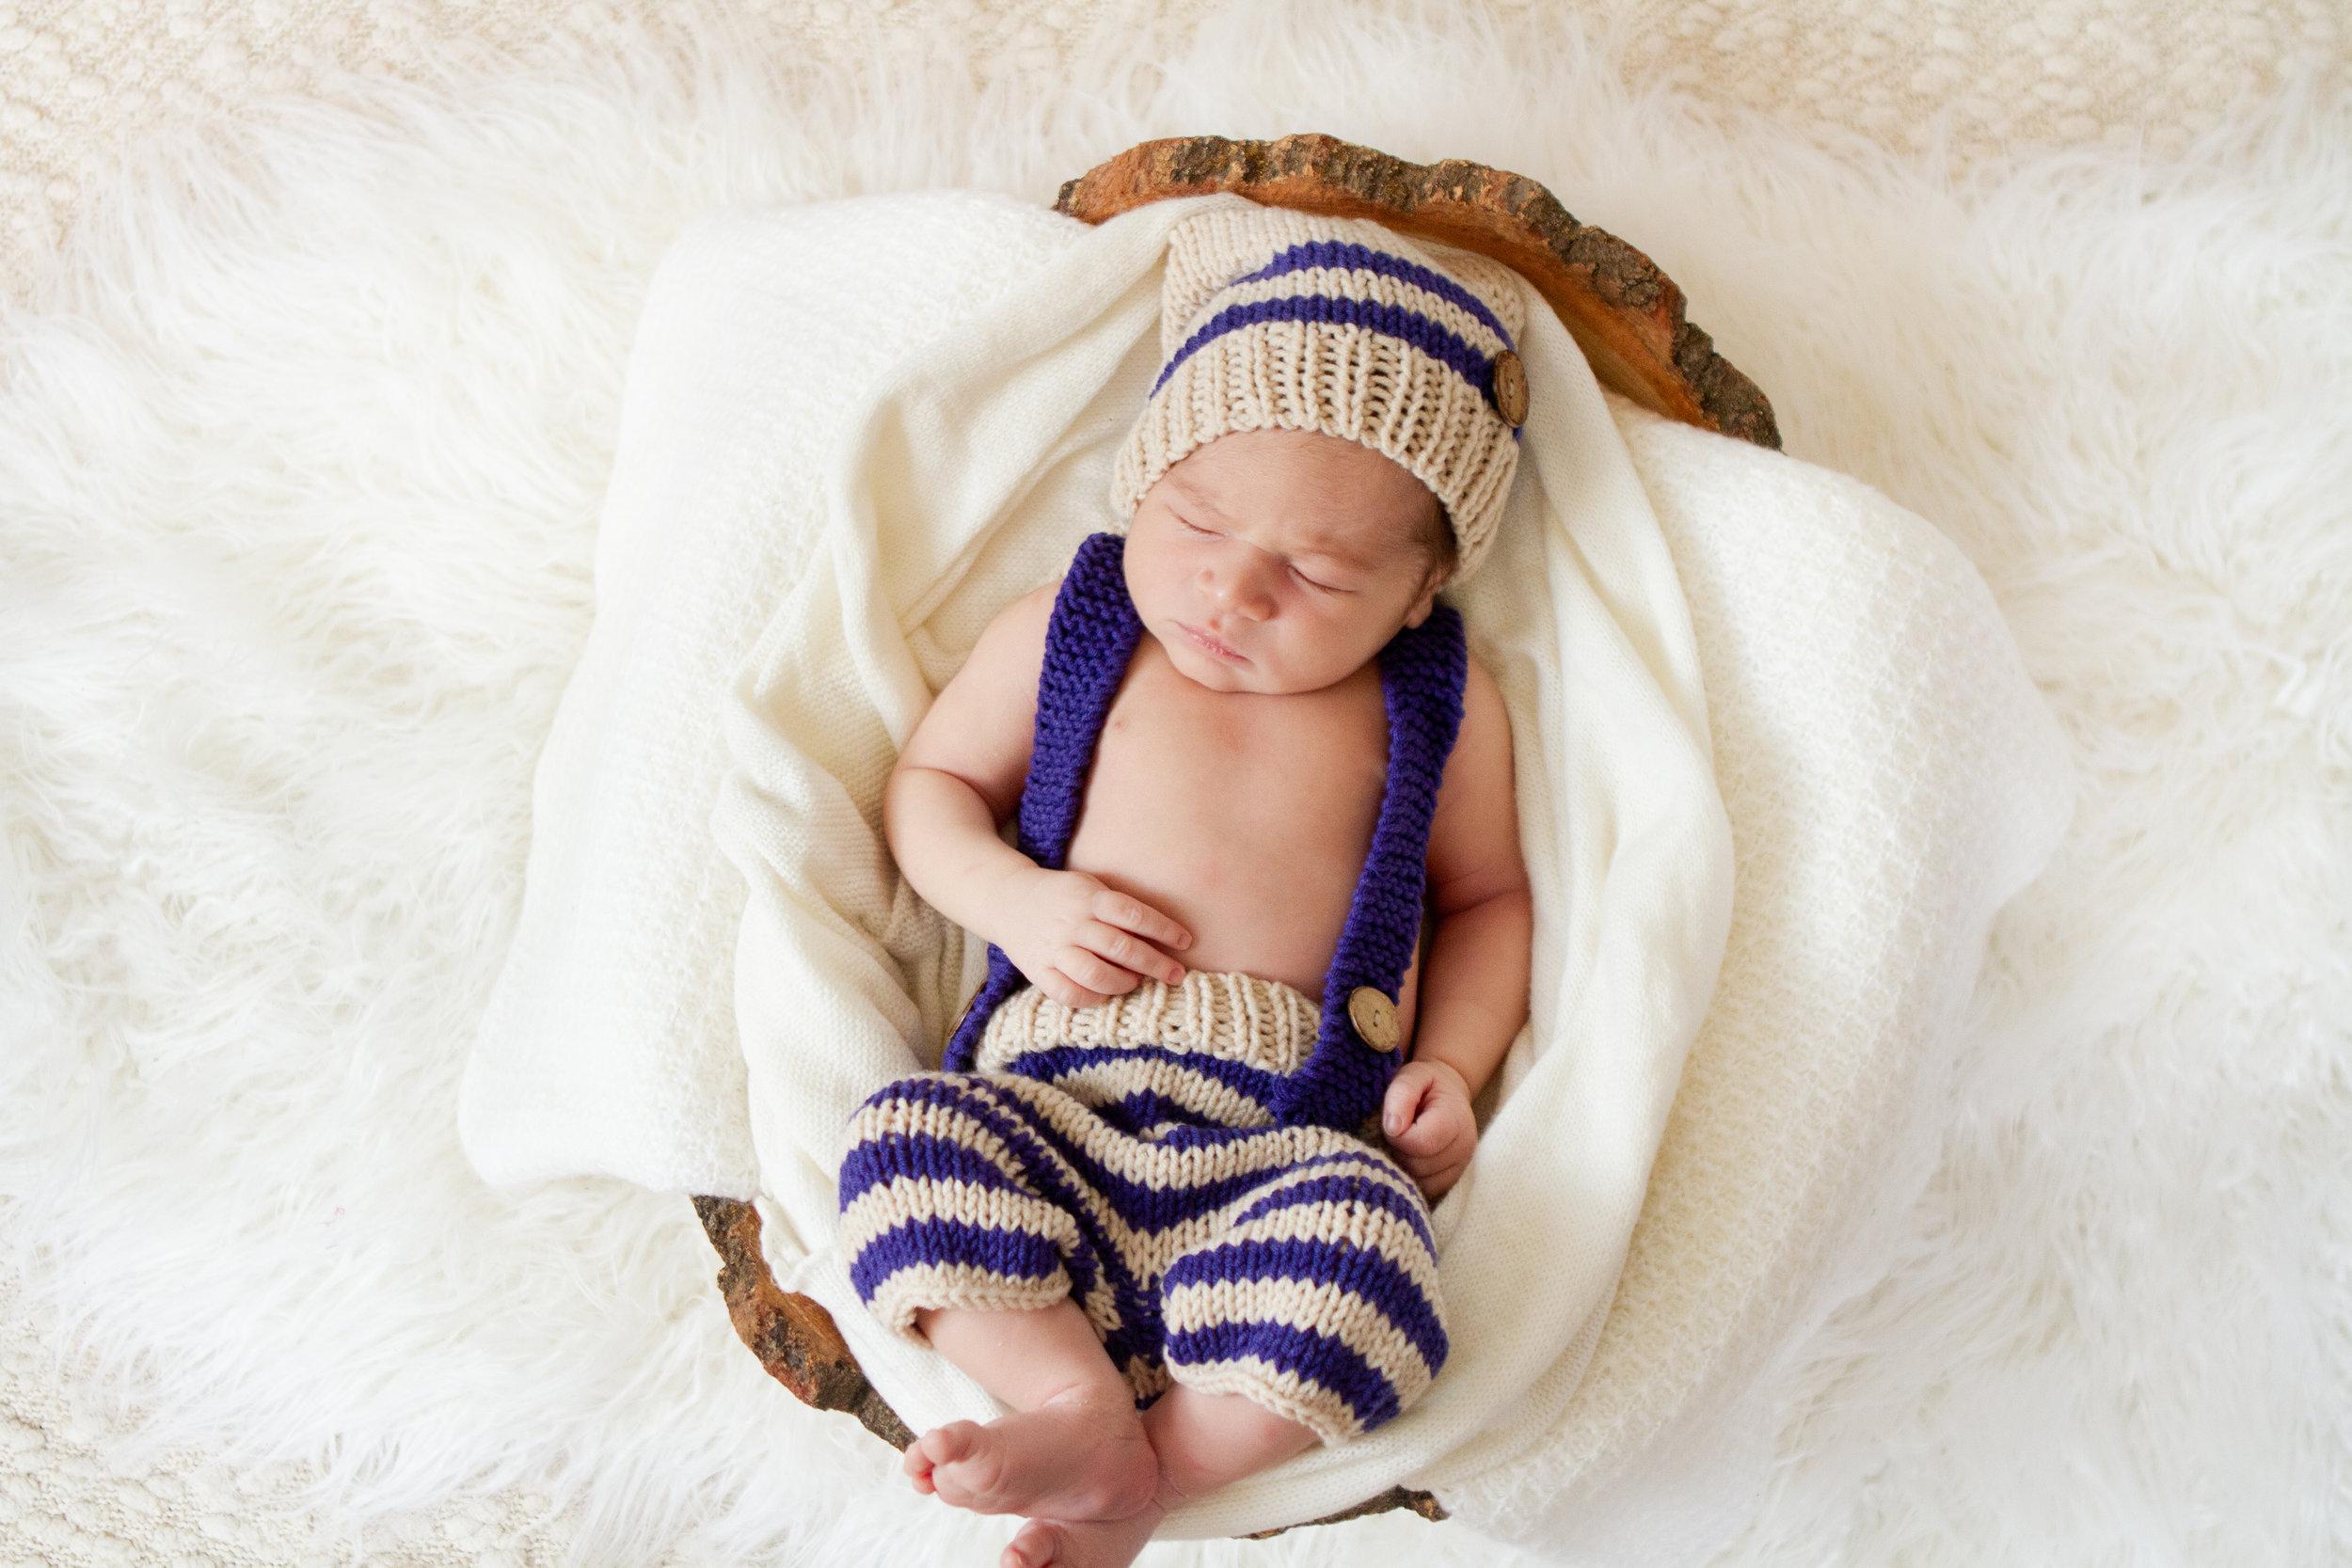 Massachusetts Newborn Photographer, Connecticut Newborn Photographer, Rhode Island Newborn Photographer,  Shannon Sorensen Photography, Scituate, Duxbury, South Shore, Newington, Boston, Hartford